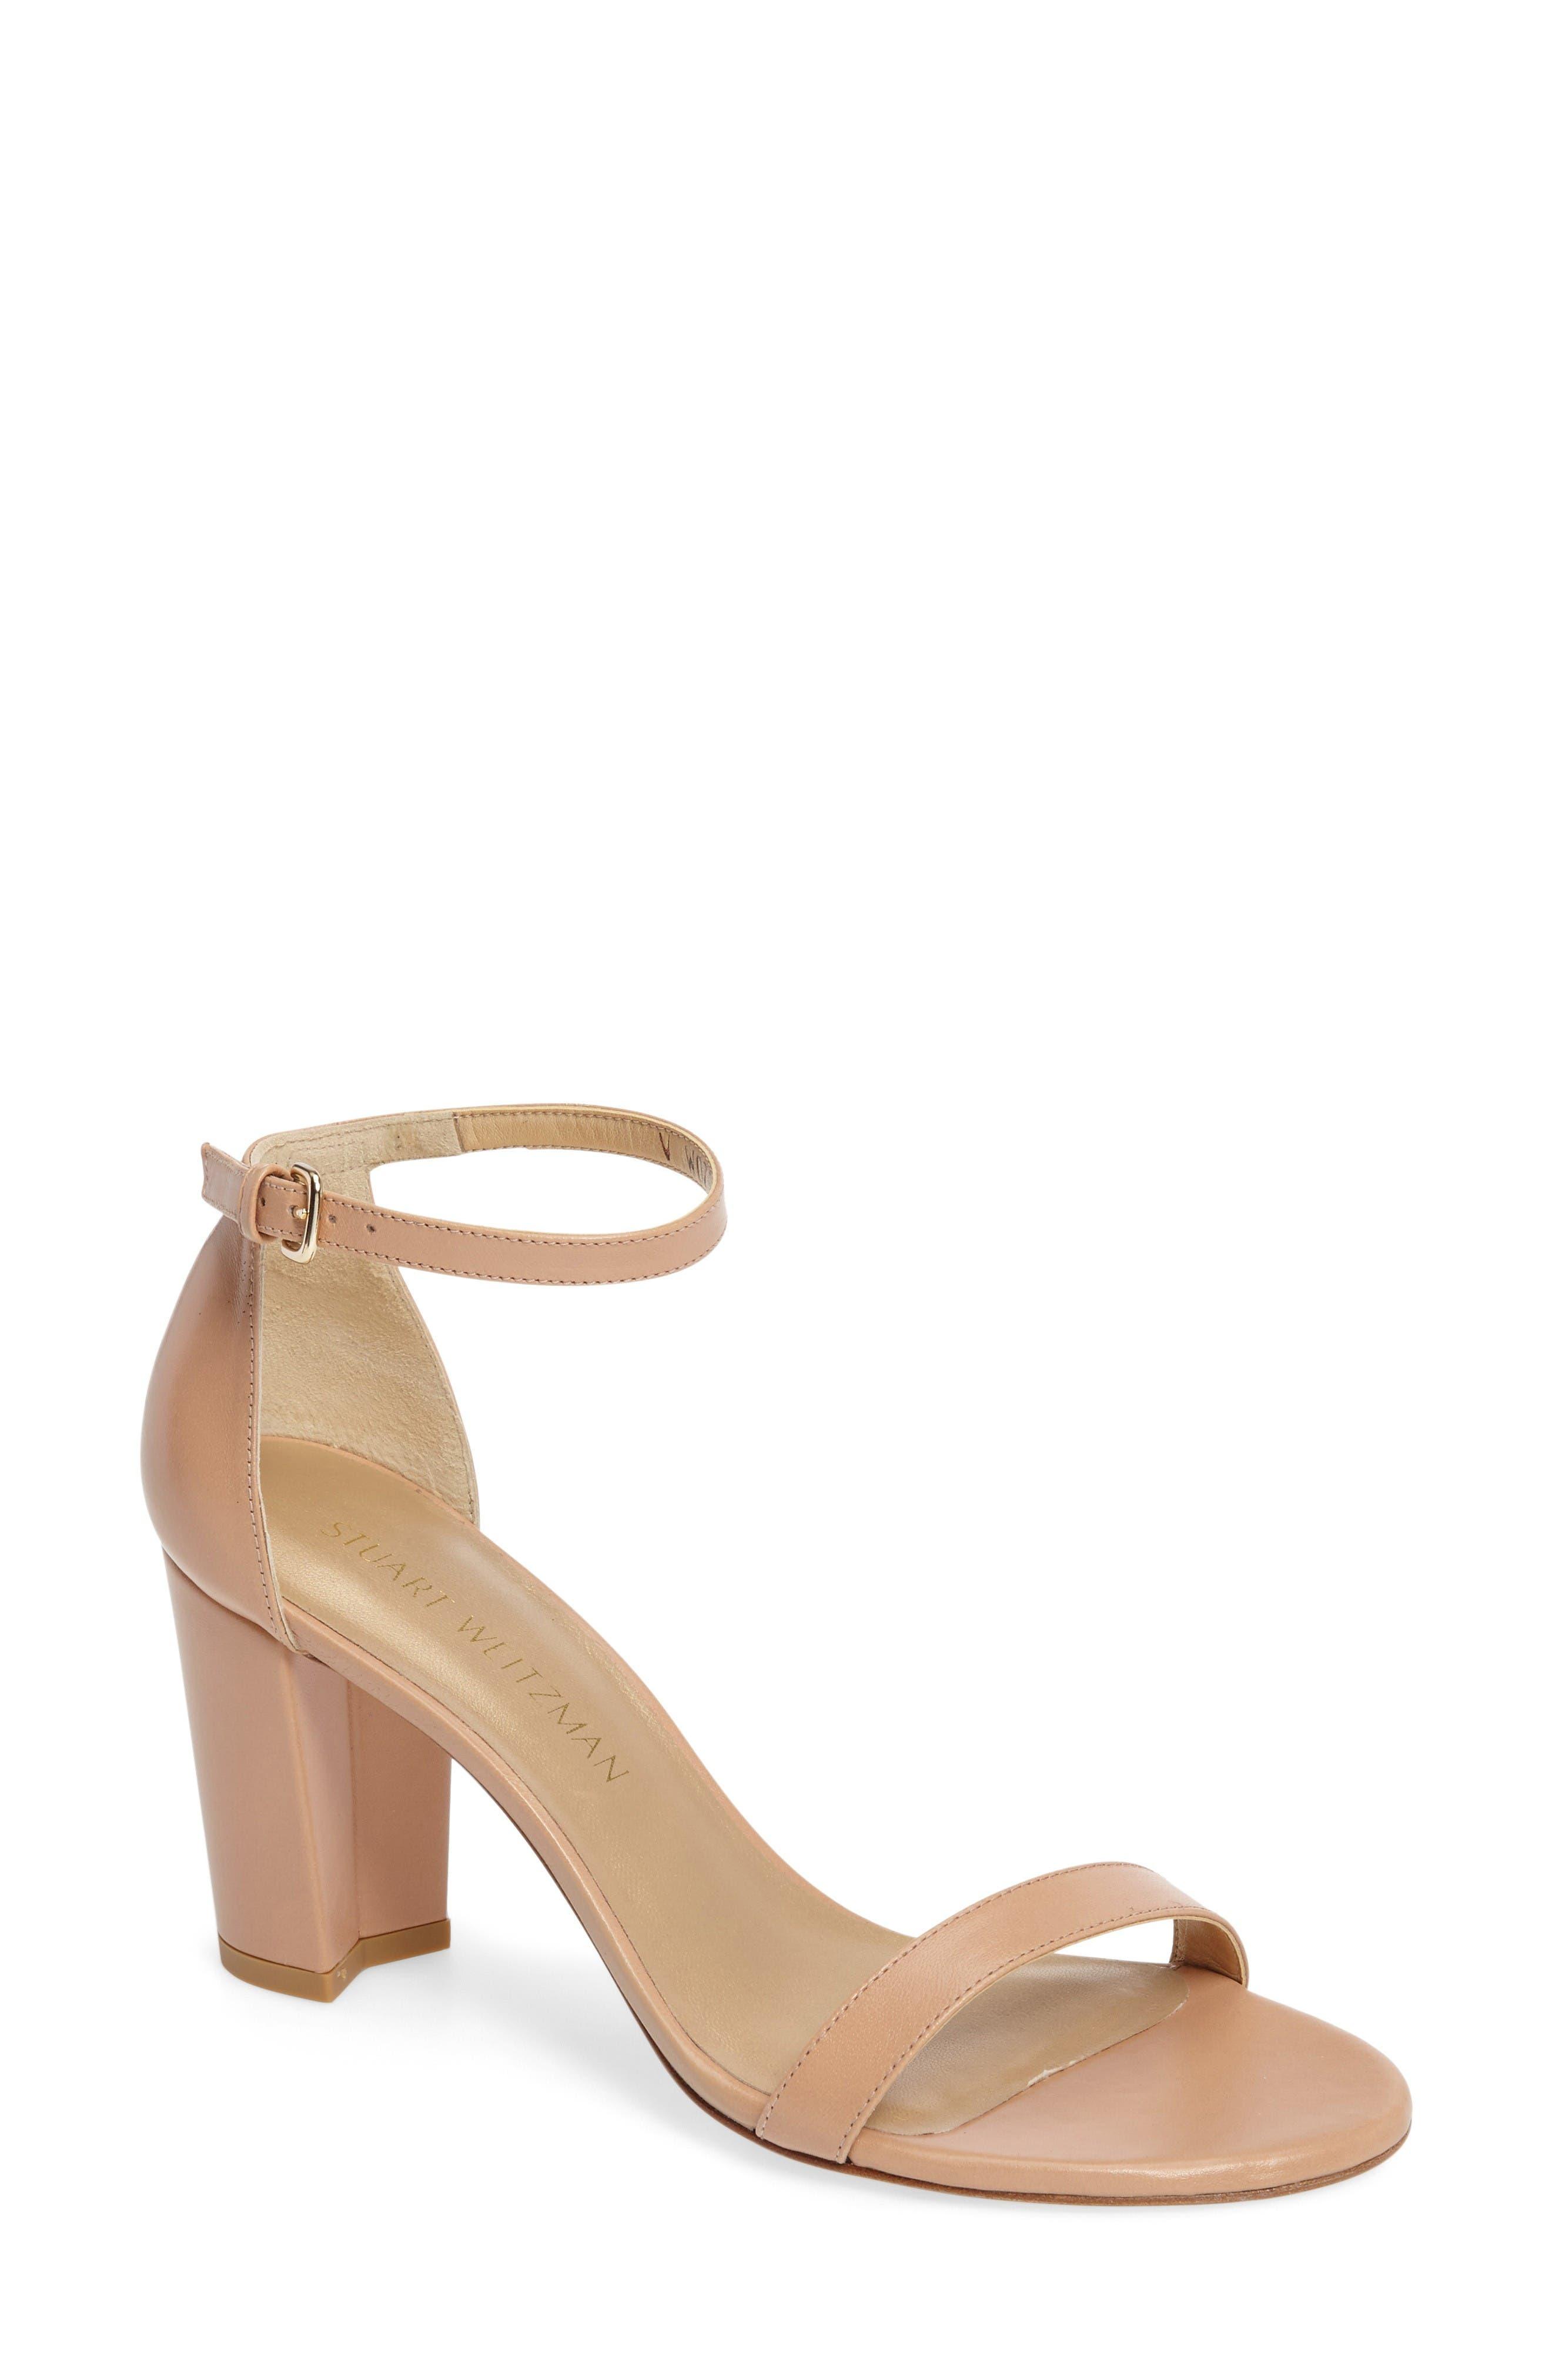 NearlyNude Ankle Strap Sandal,                         Main,                         color, Bambina Nappa